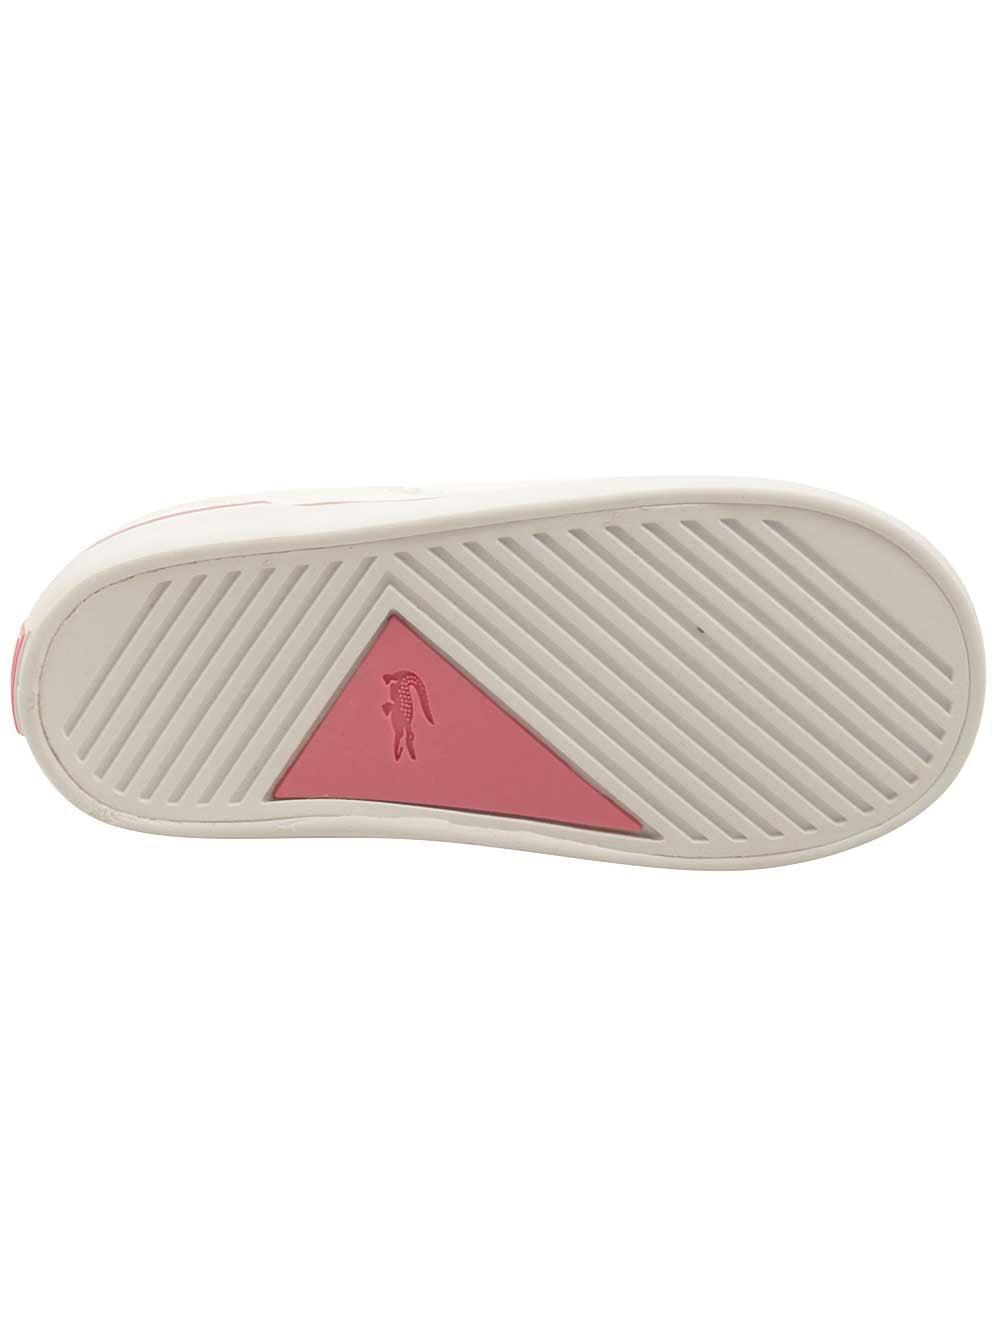 fba7342668c546 Lacoste Infant Lerond 218 2 Sneaker - Walmart.com